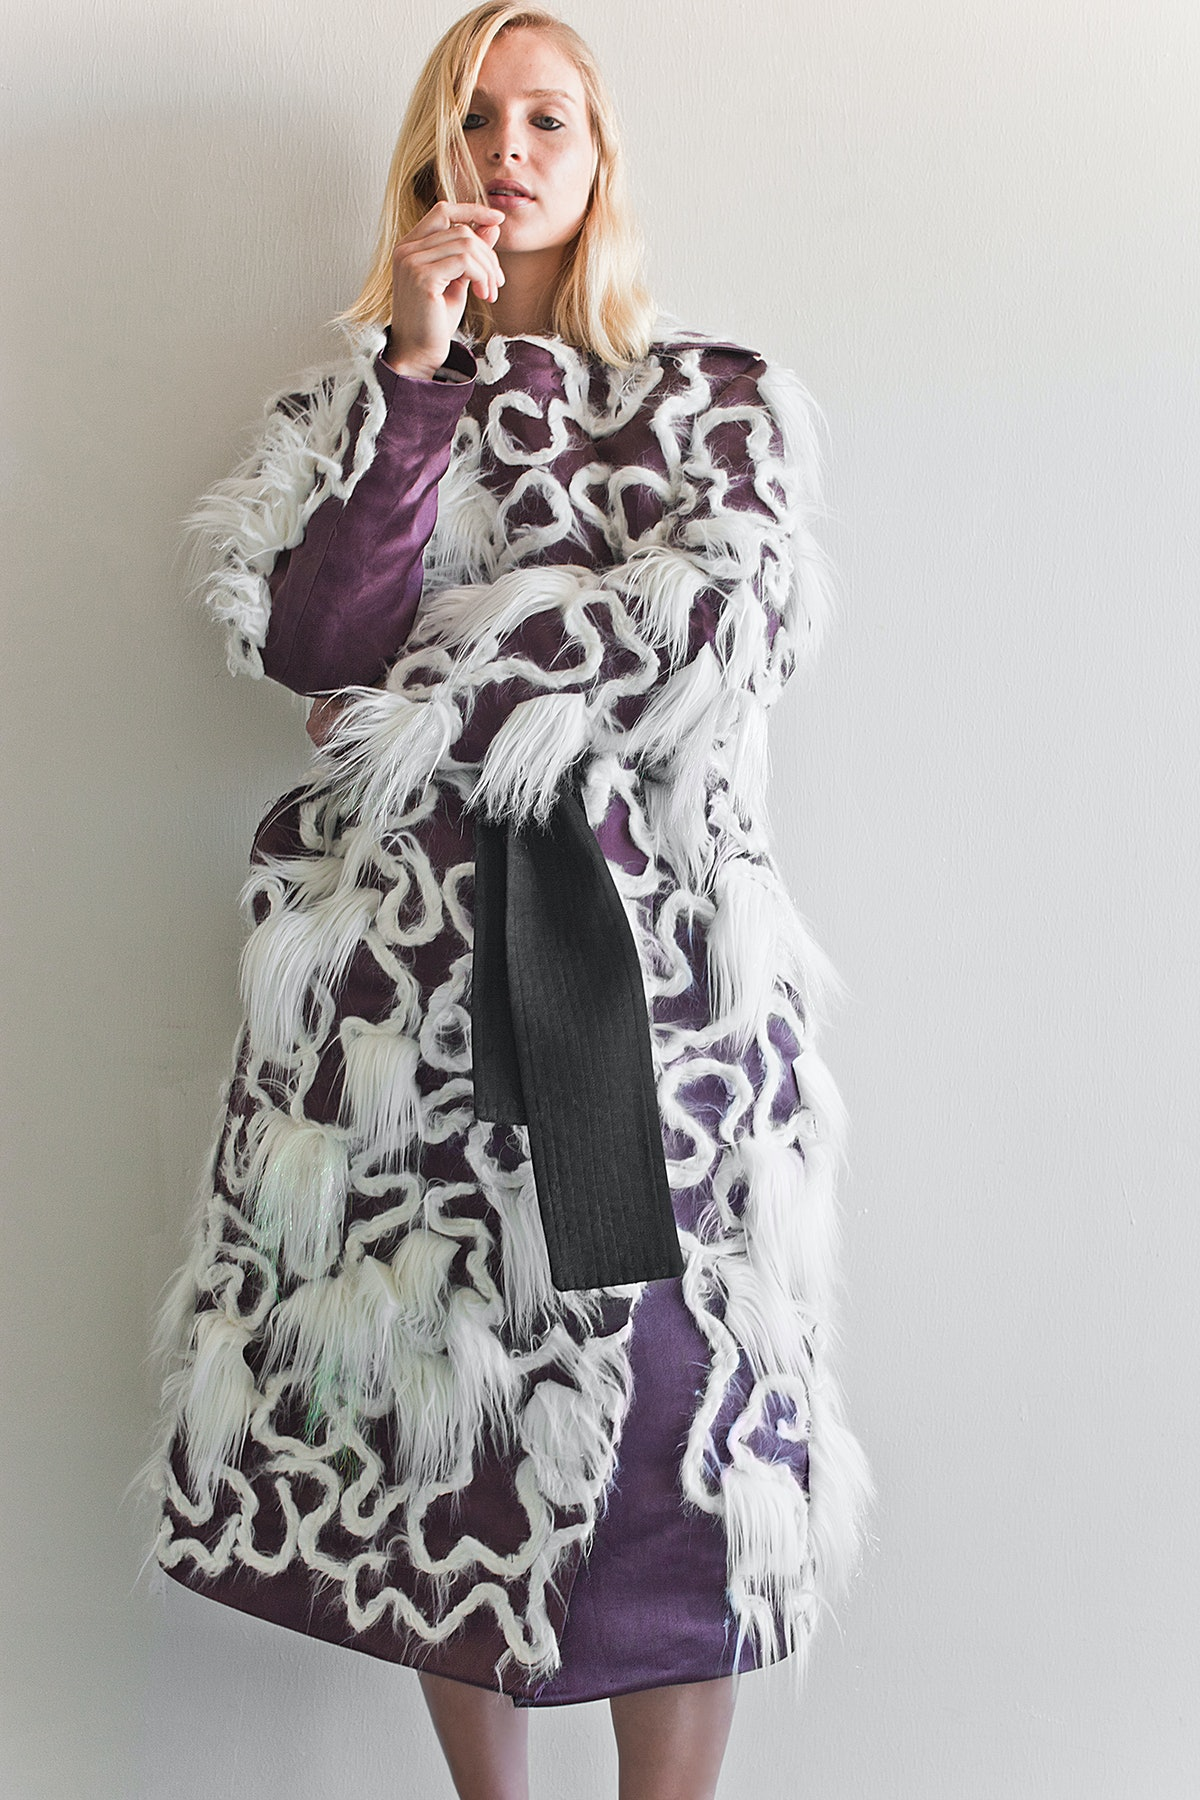 finnish-fashion-8